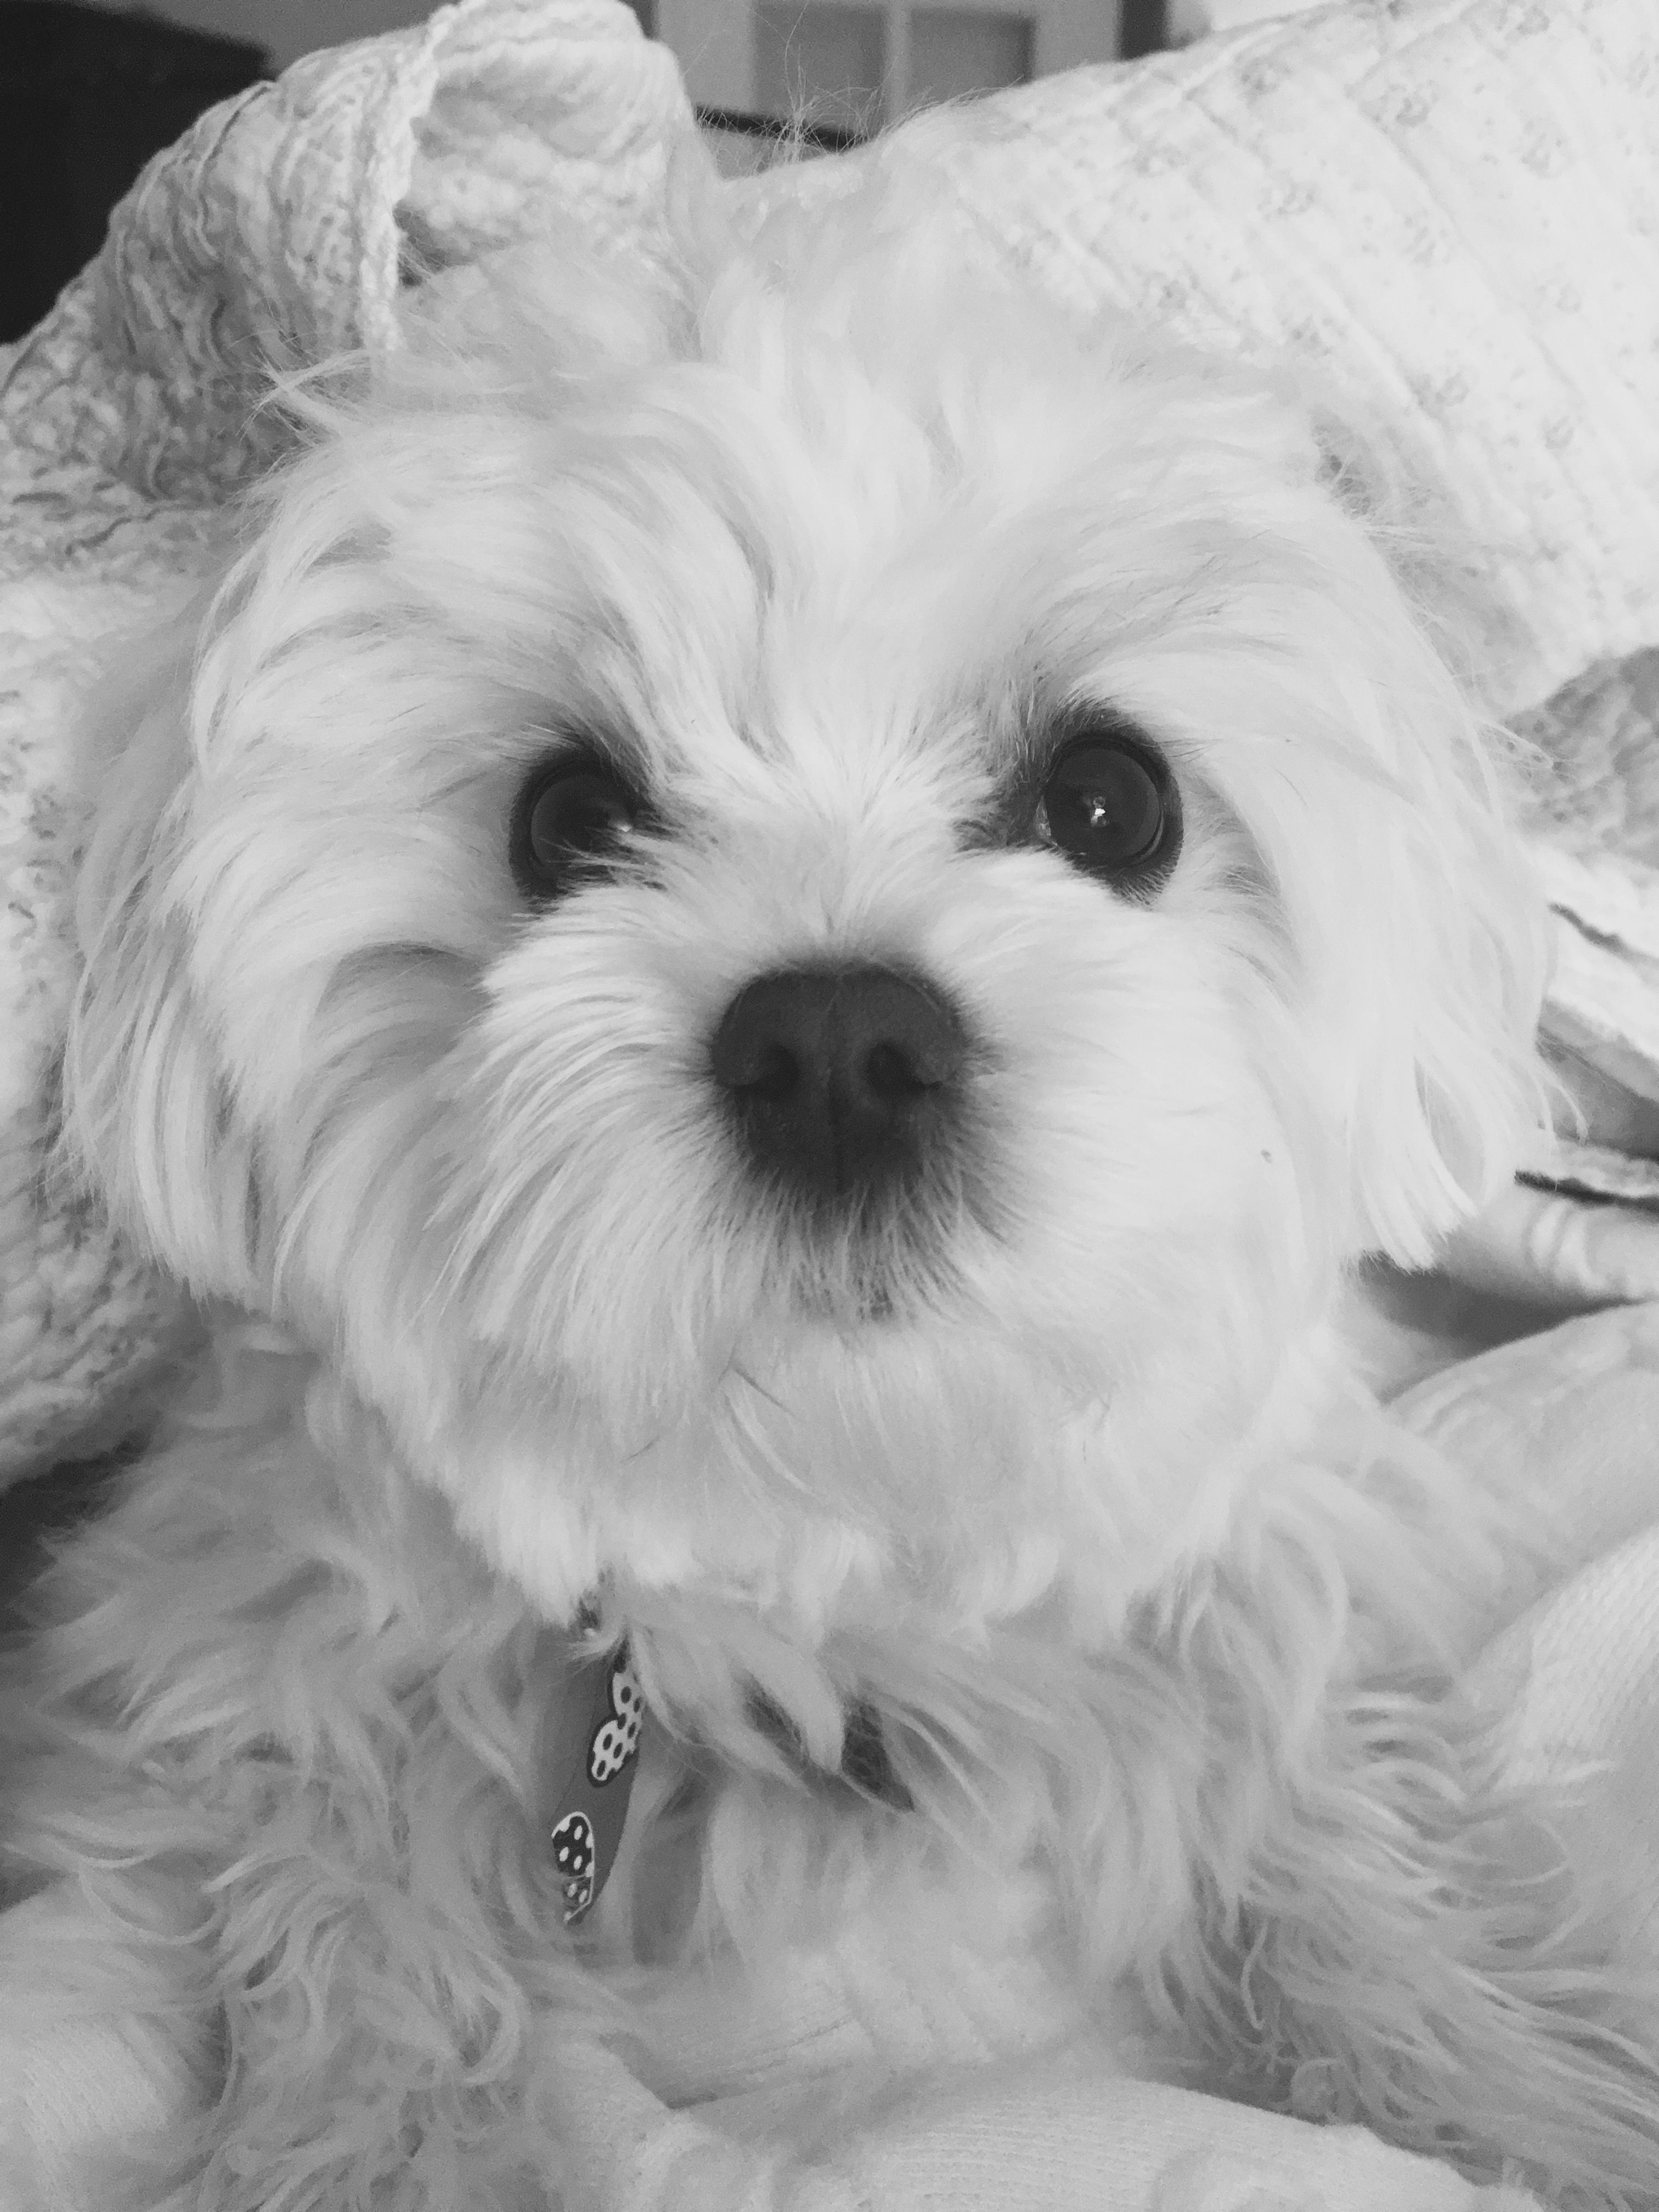 Mabel Our Malshi Puppy Puppies Shih Tzu Puppy Shih Tzu